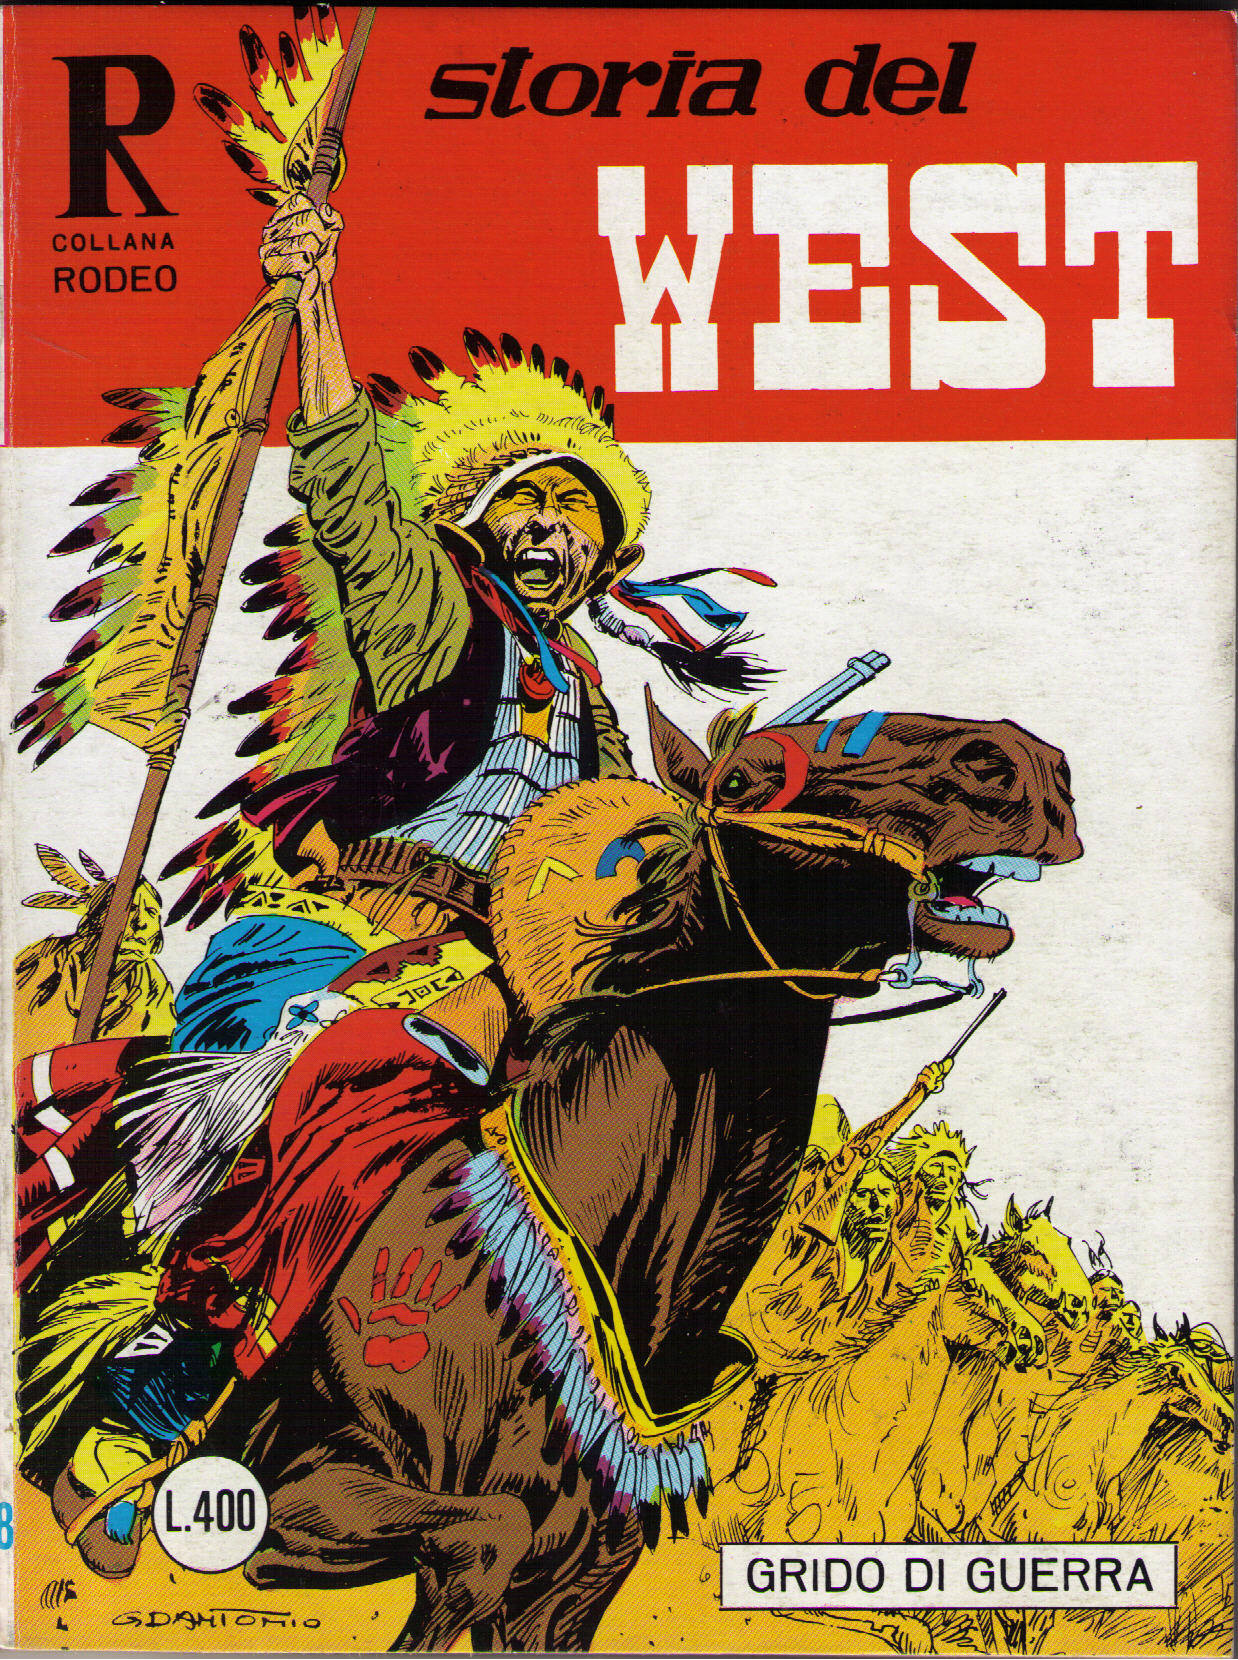 Storia del West n.54 (Collana Rodeo n. 128)